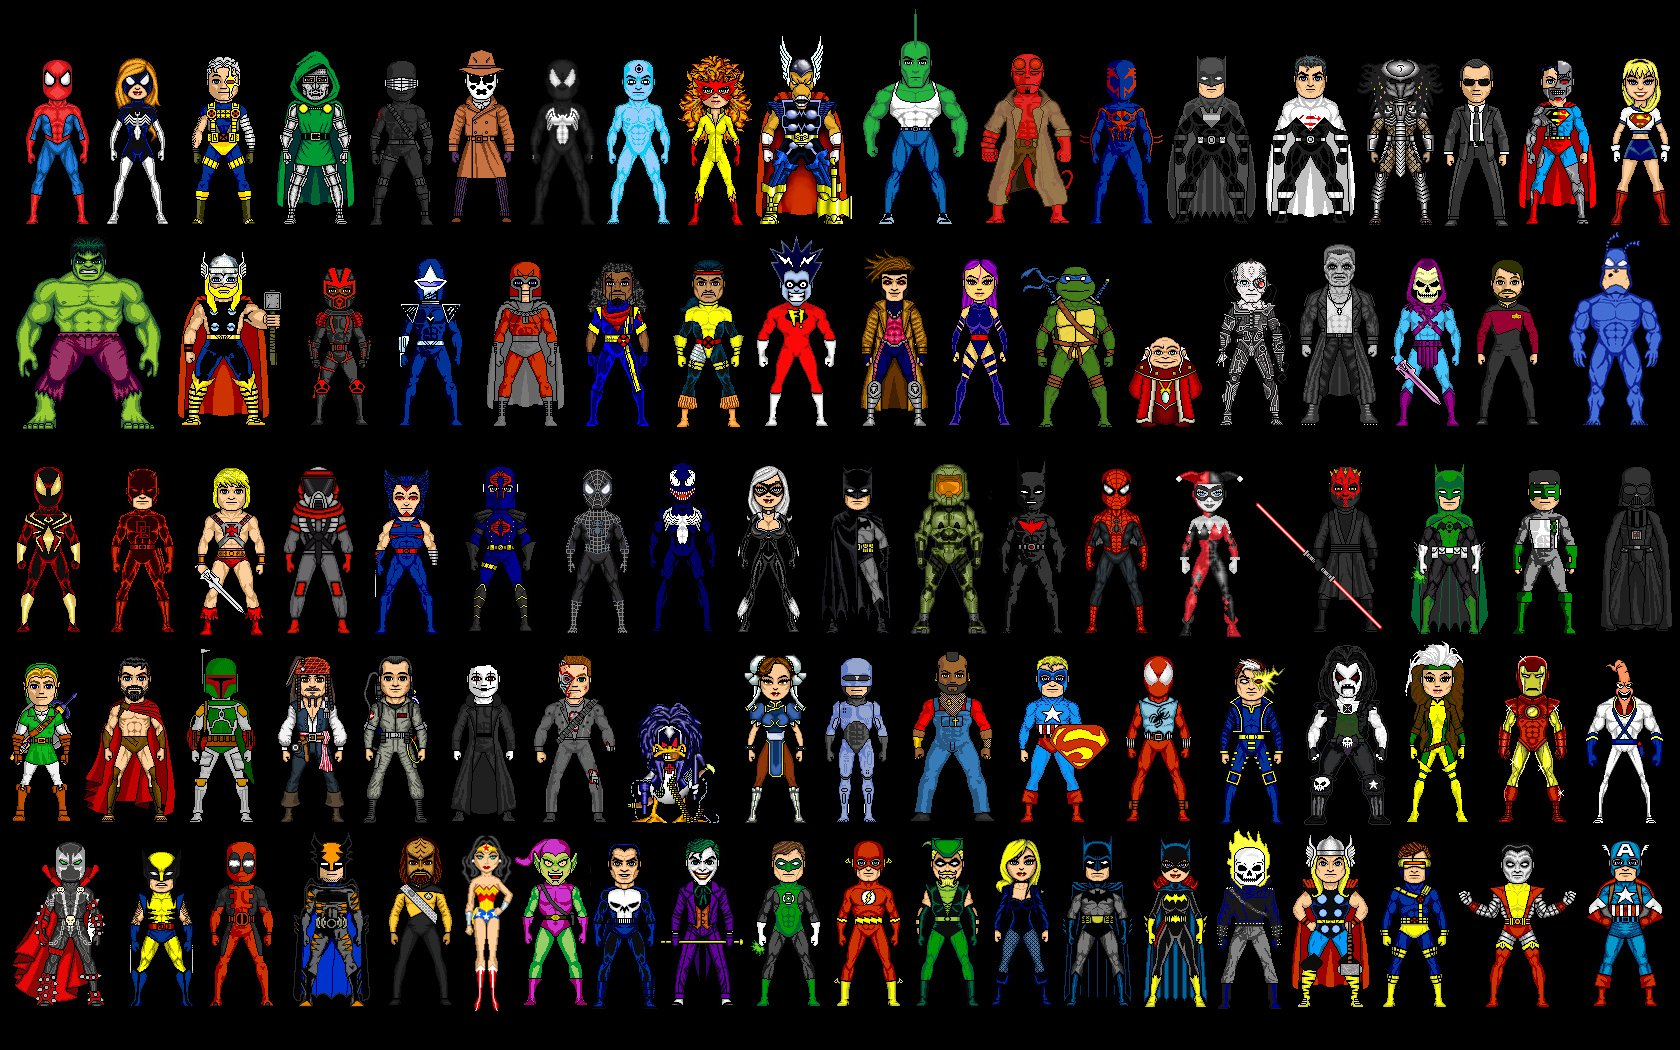 DC Comics Wallpaper 1680x1050 DC Comics Suit Superheroes Ghost 1680x1050